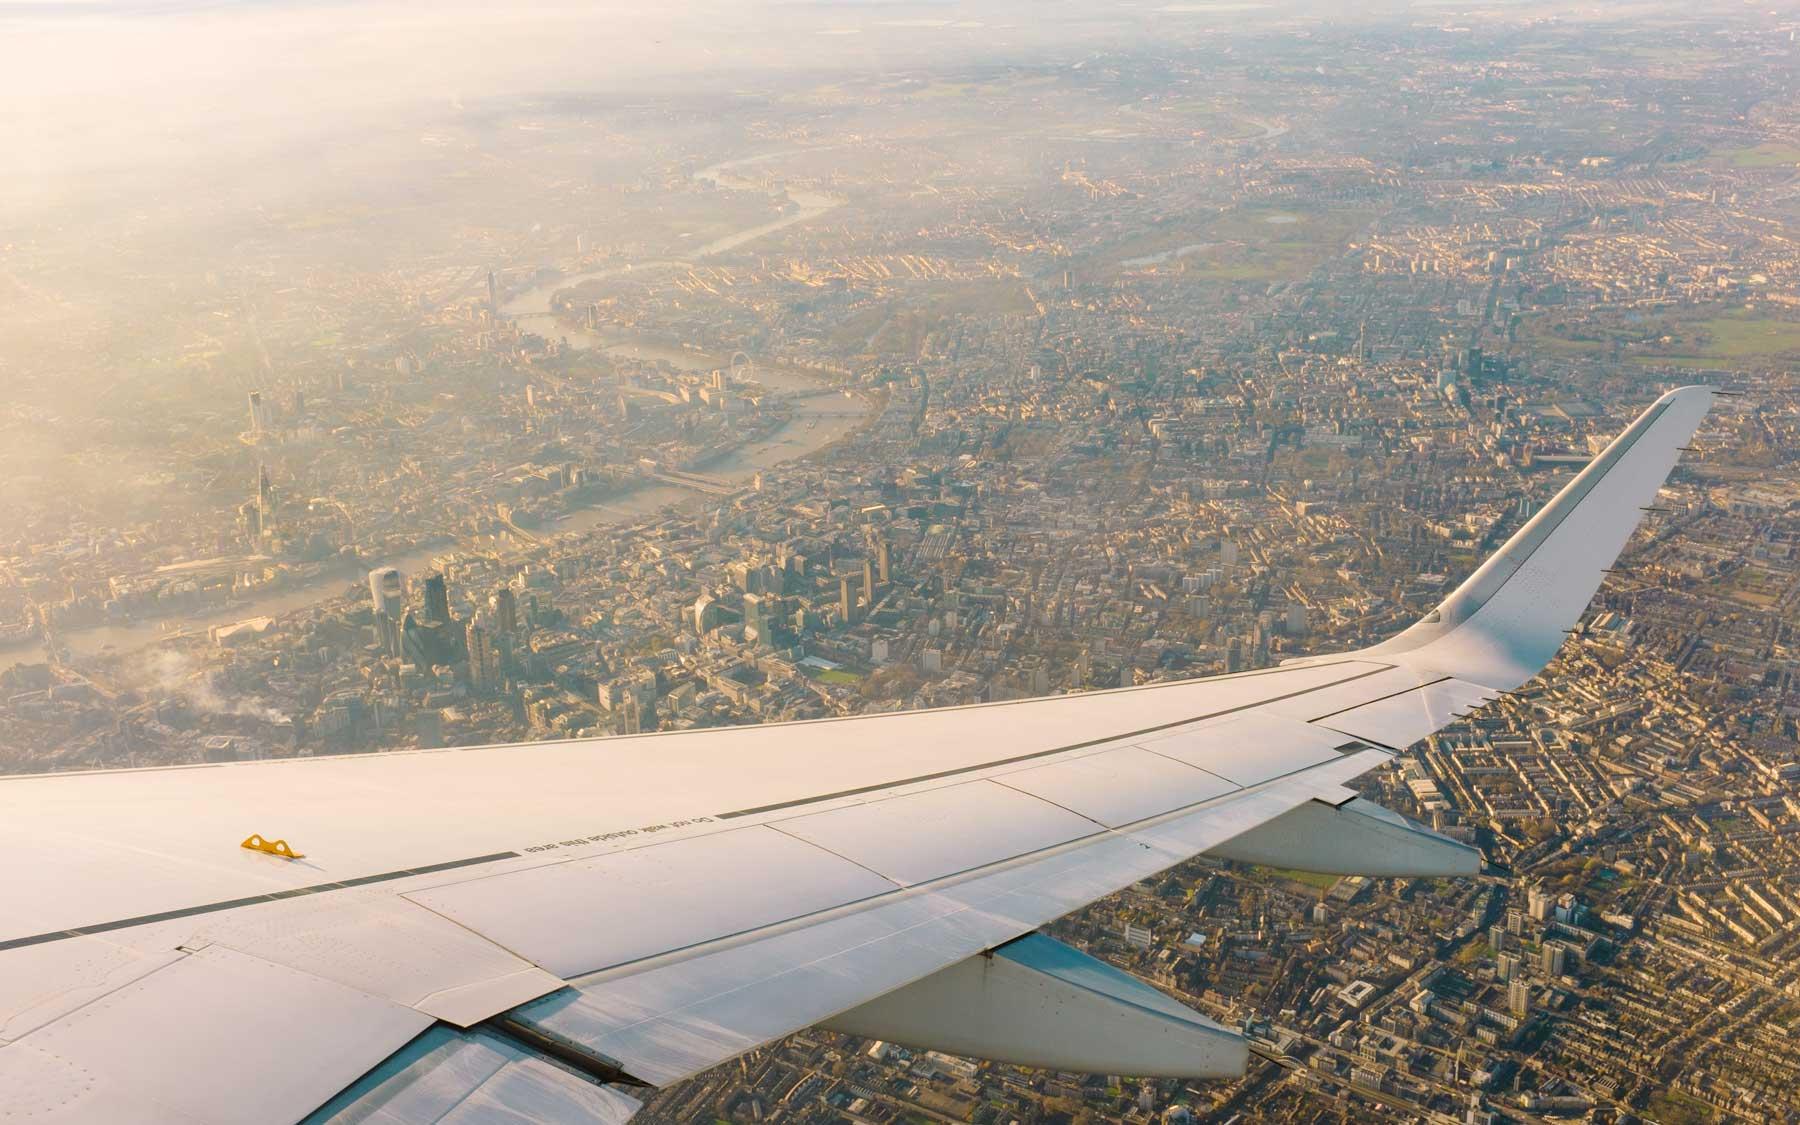 Circling over inner city London.